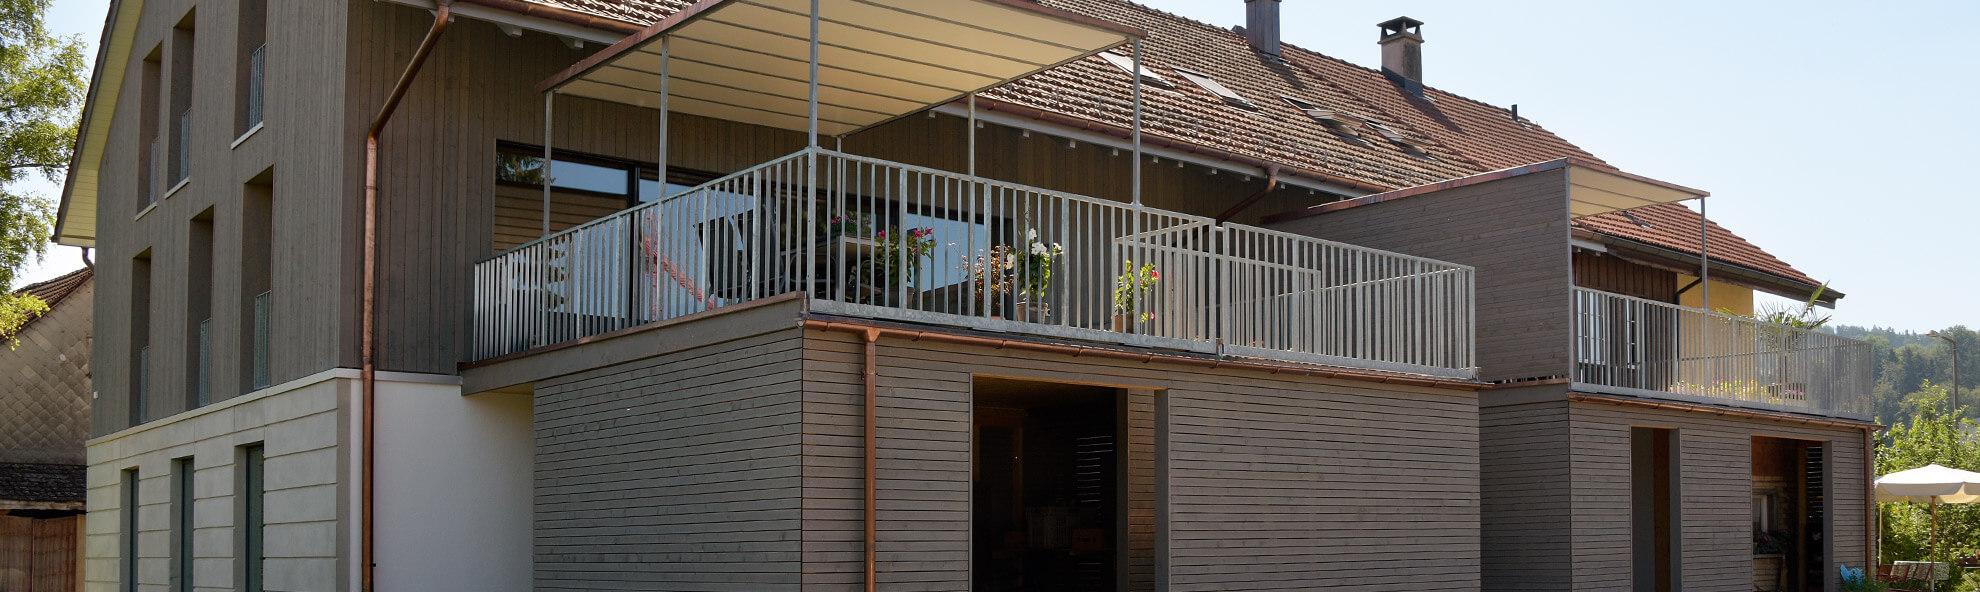 Bauprojekt projektwerke AG